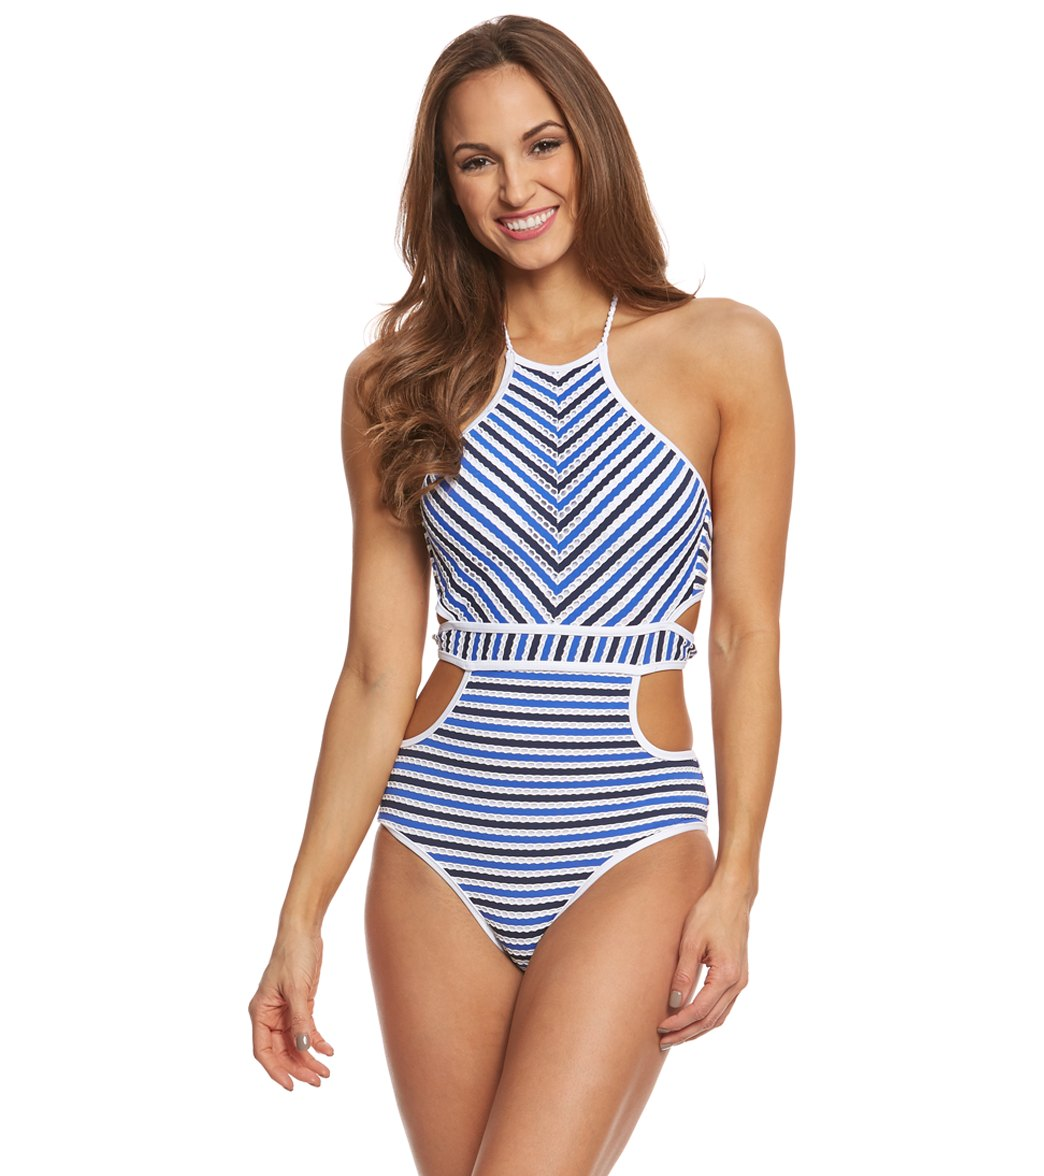 fd39068a3d7 Jessica Simpson Swimwear Maritime High Neck Monokini